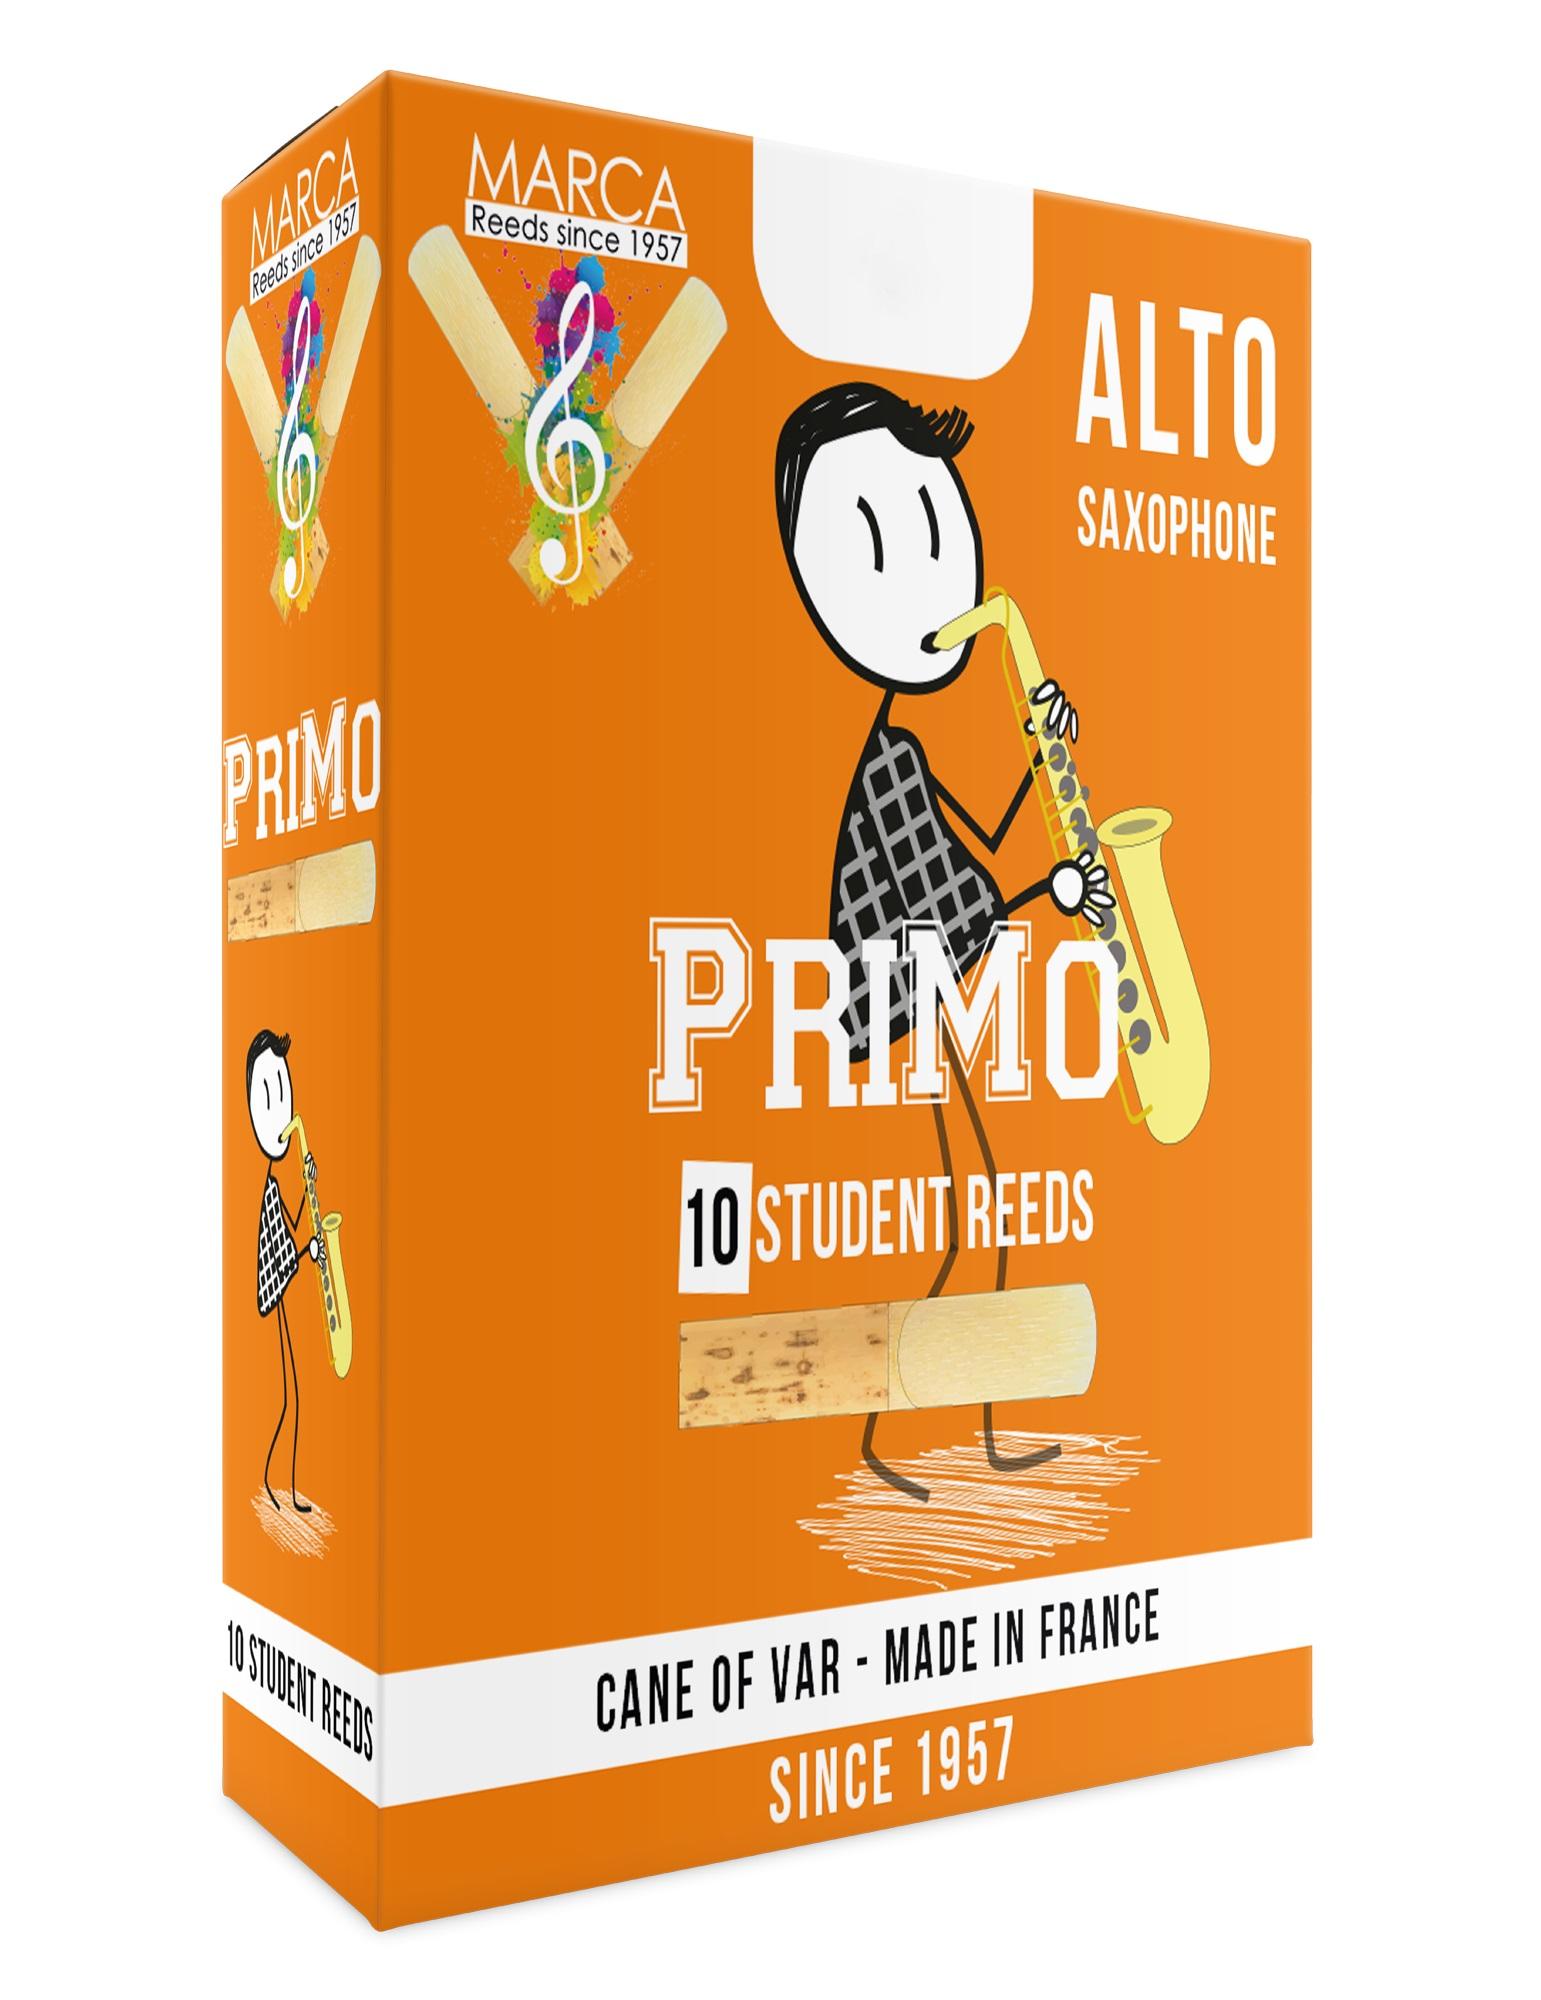 Marca Alt saxofon Primo 2 - box